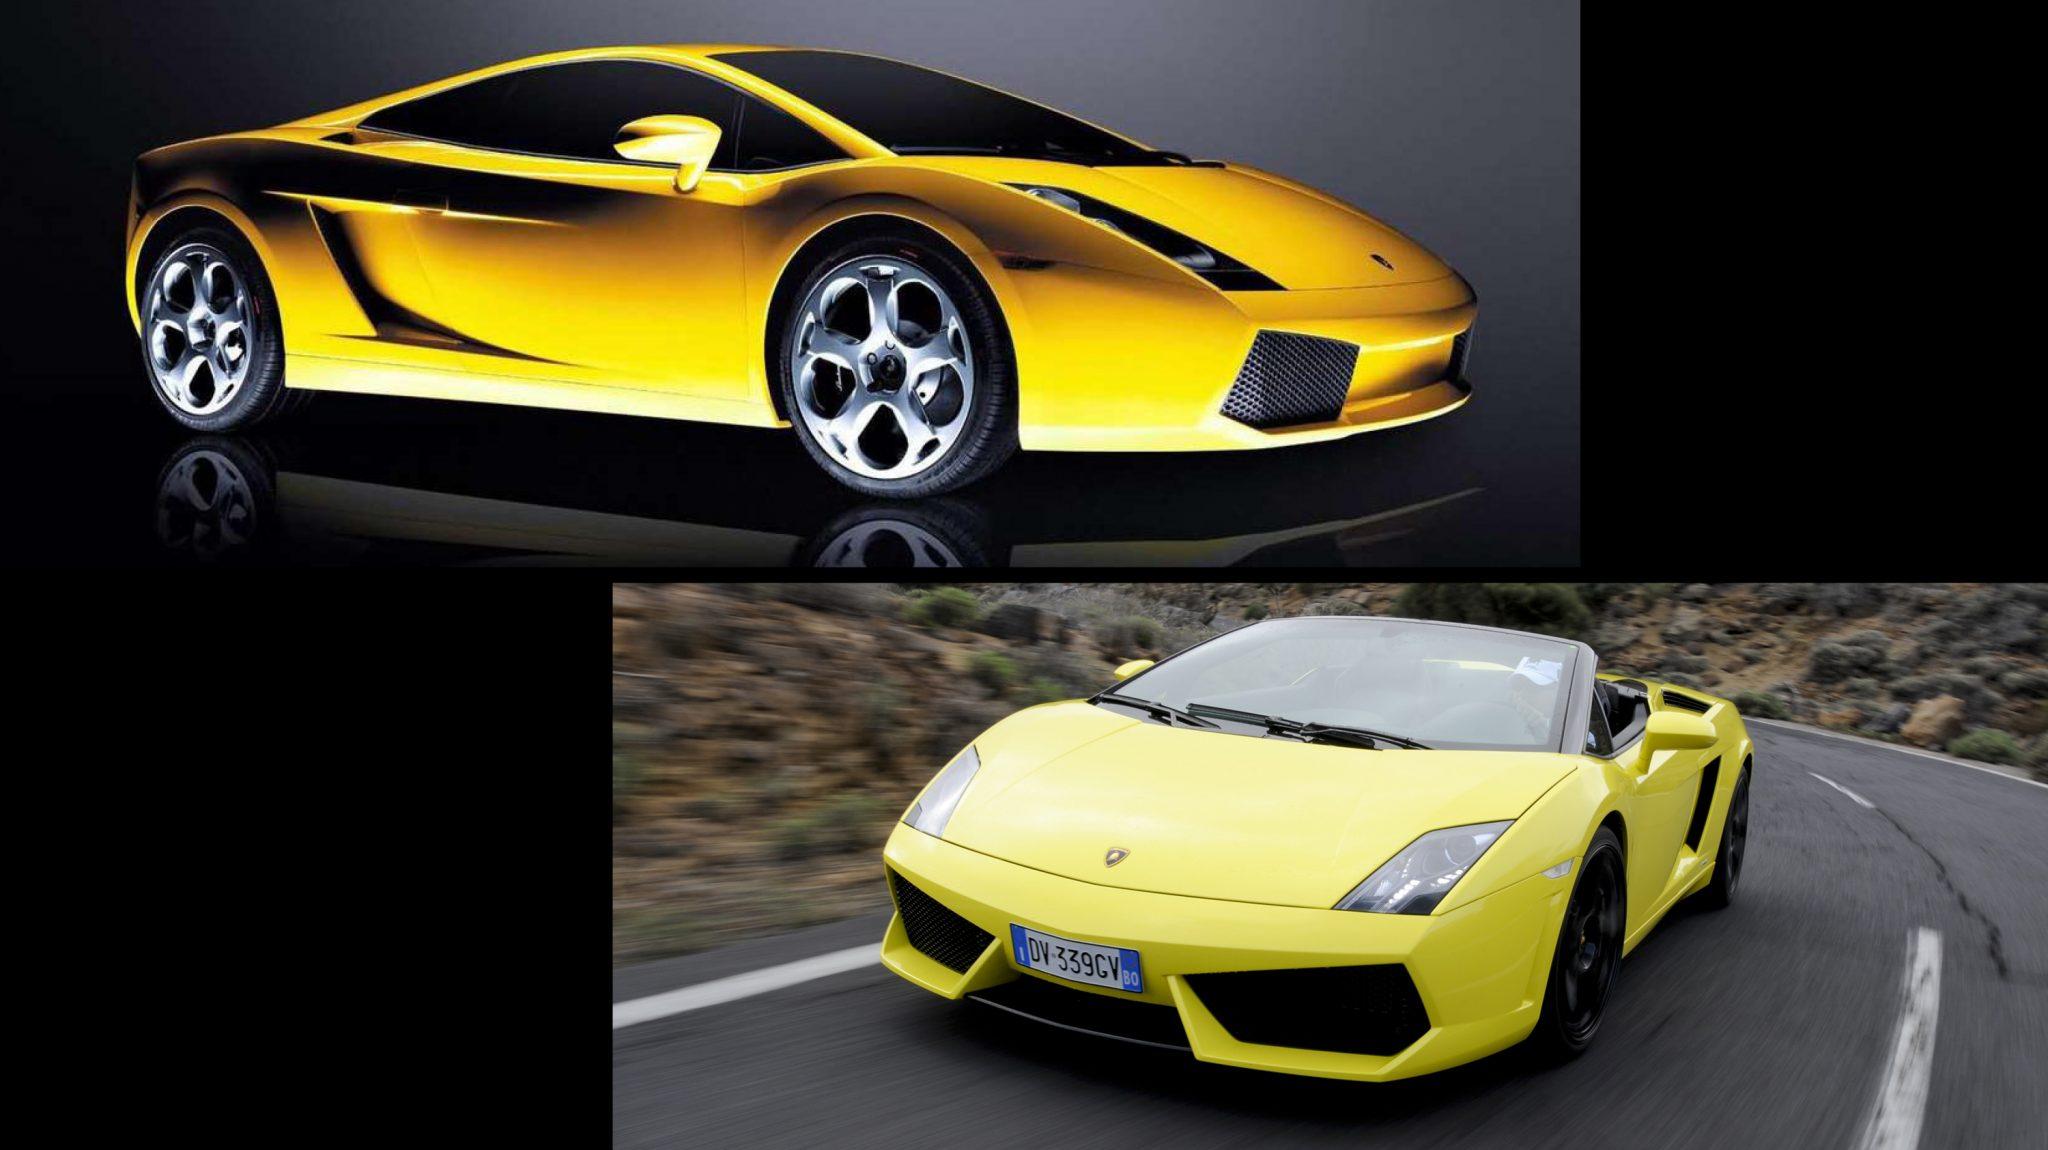 Lamborghini Gallardo Facelift vs Pre-facelift